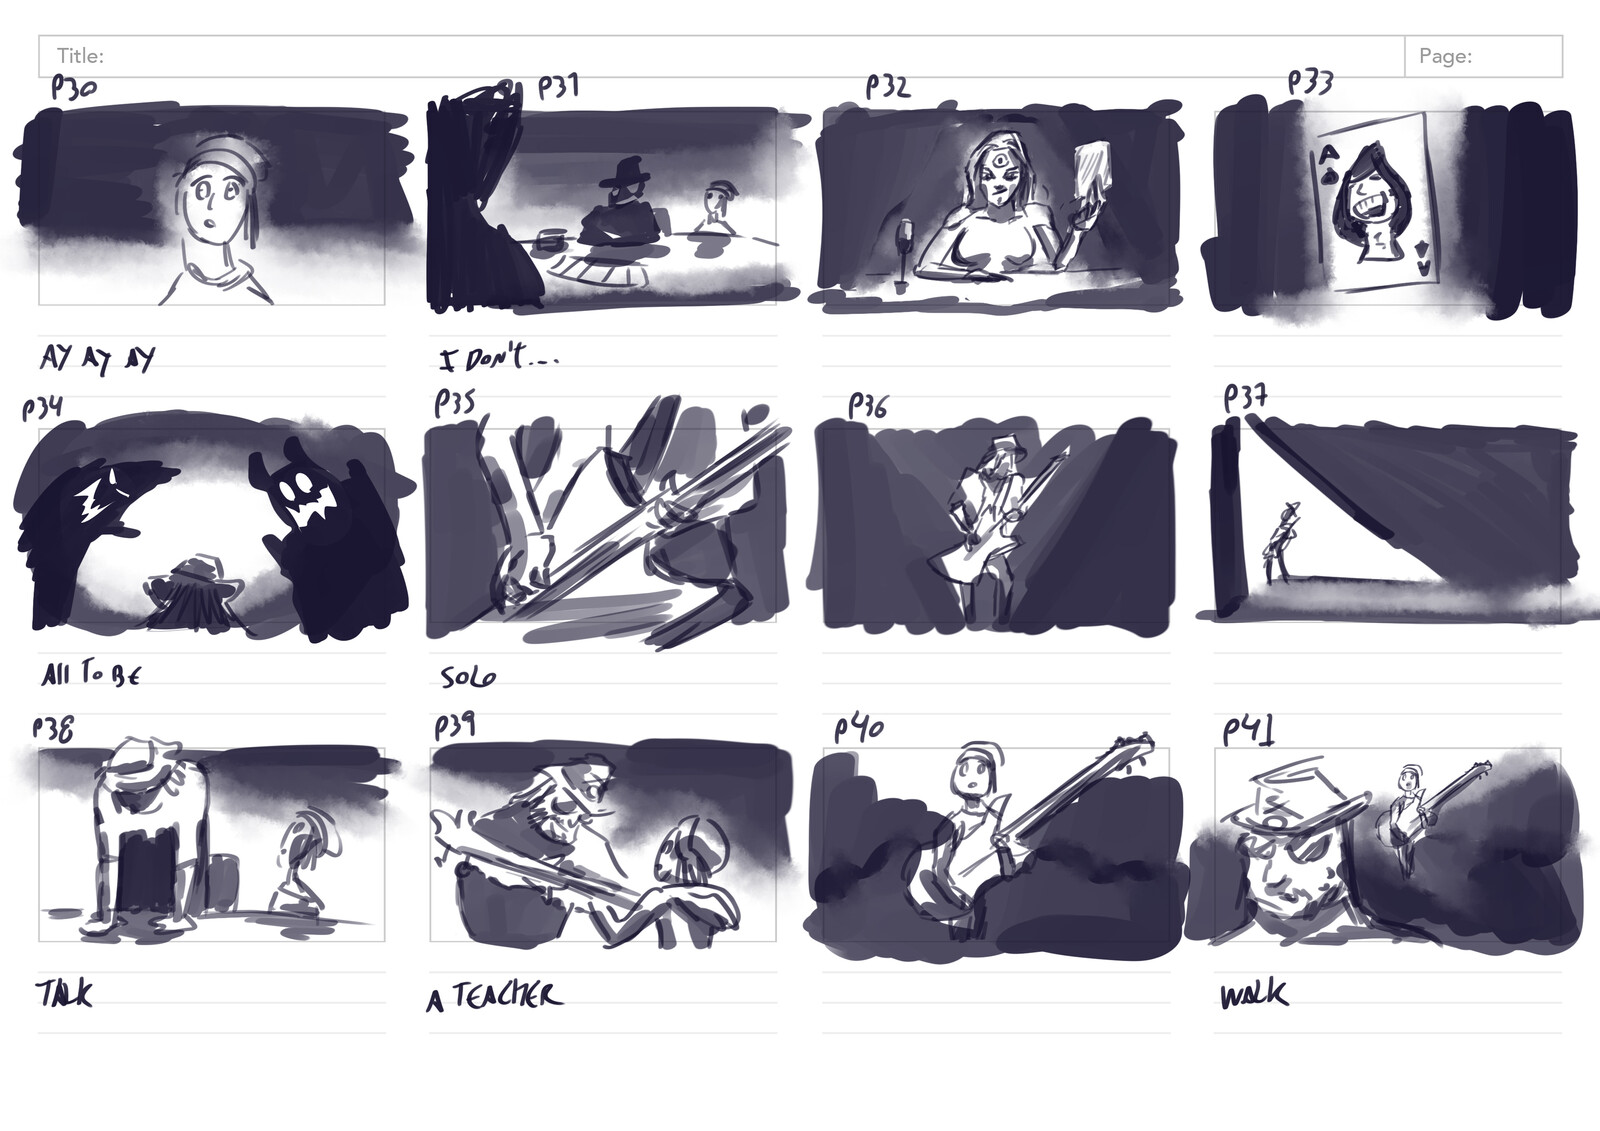 Storyboard 4/6